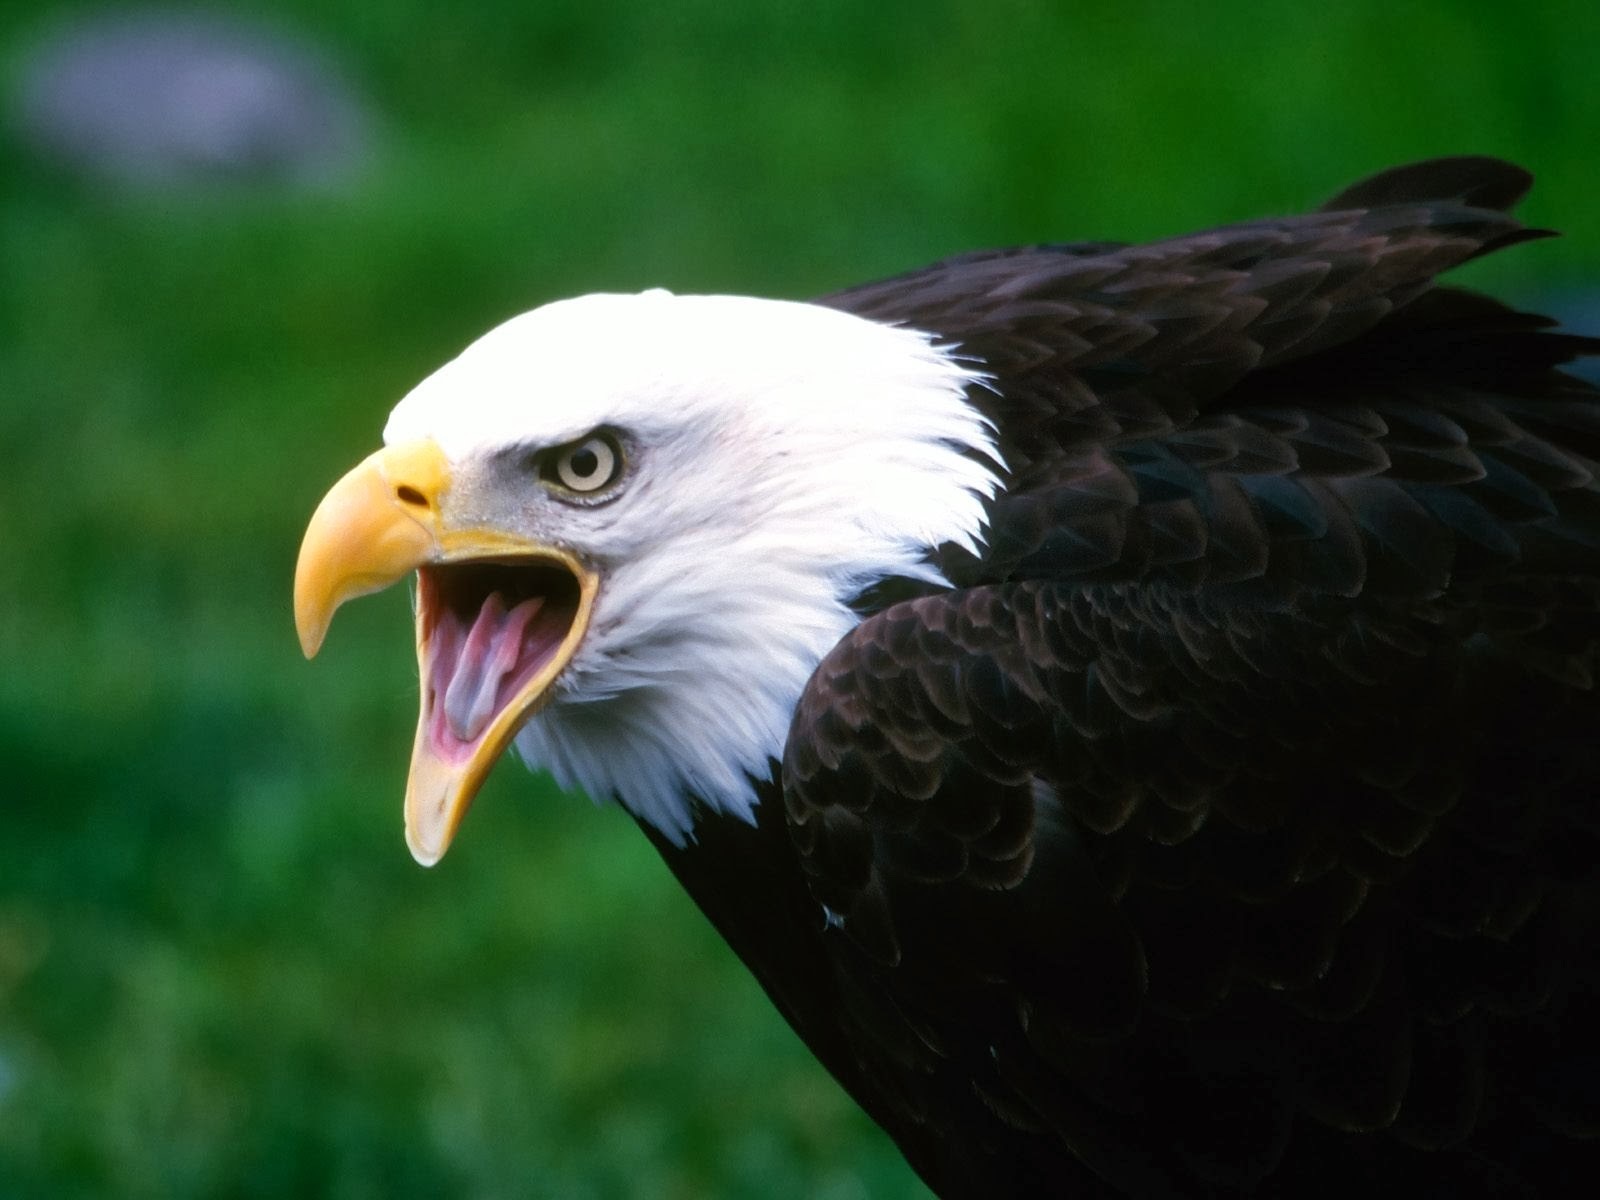 Must see   Wallpaper Horse Eagle - Eagle+wallpapers+hd+(3)  Photograph_18522.jpg